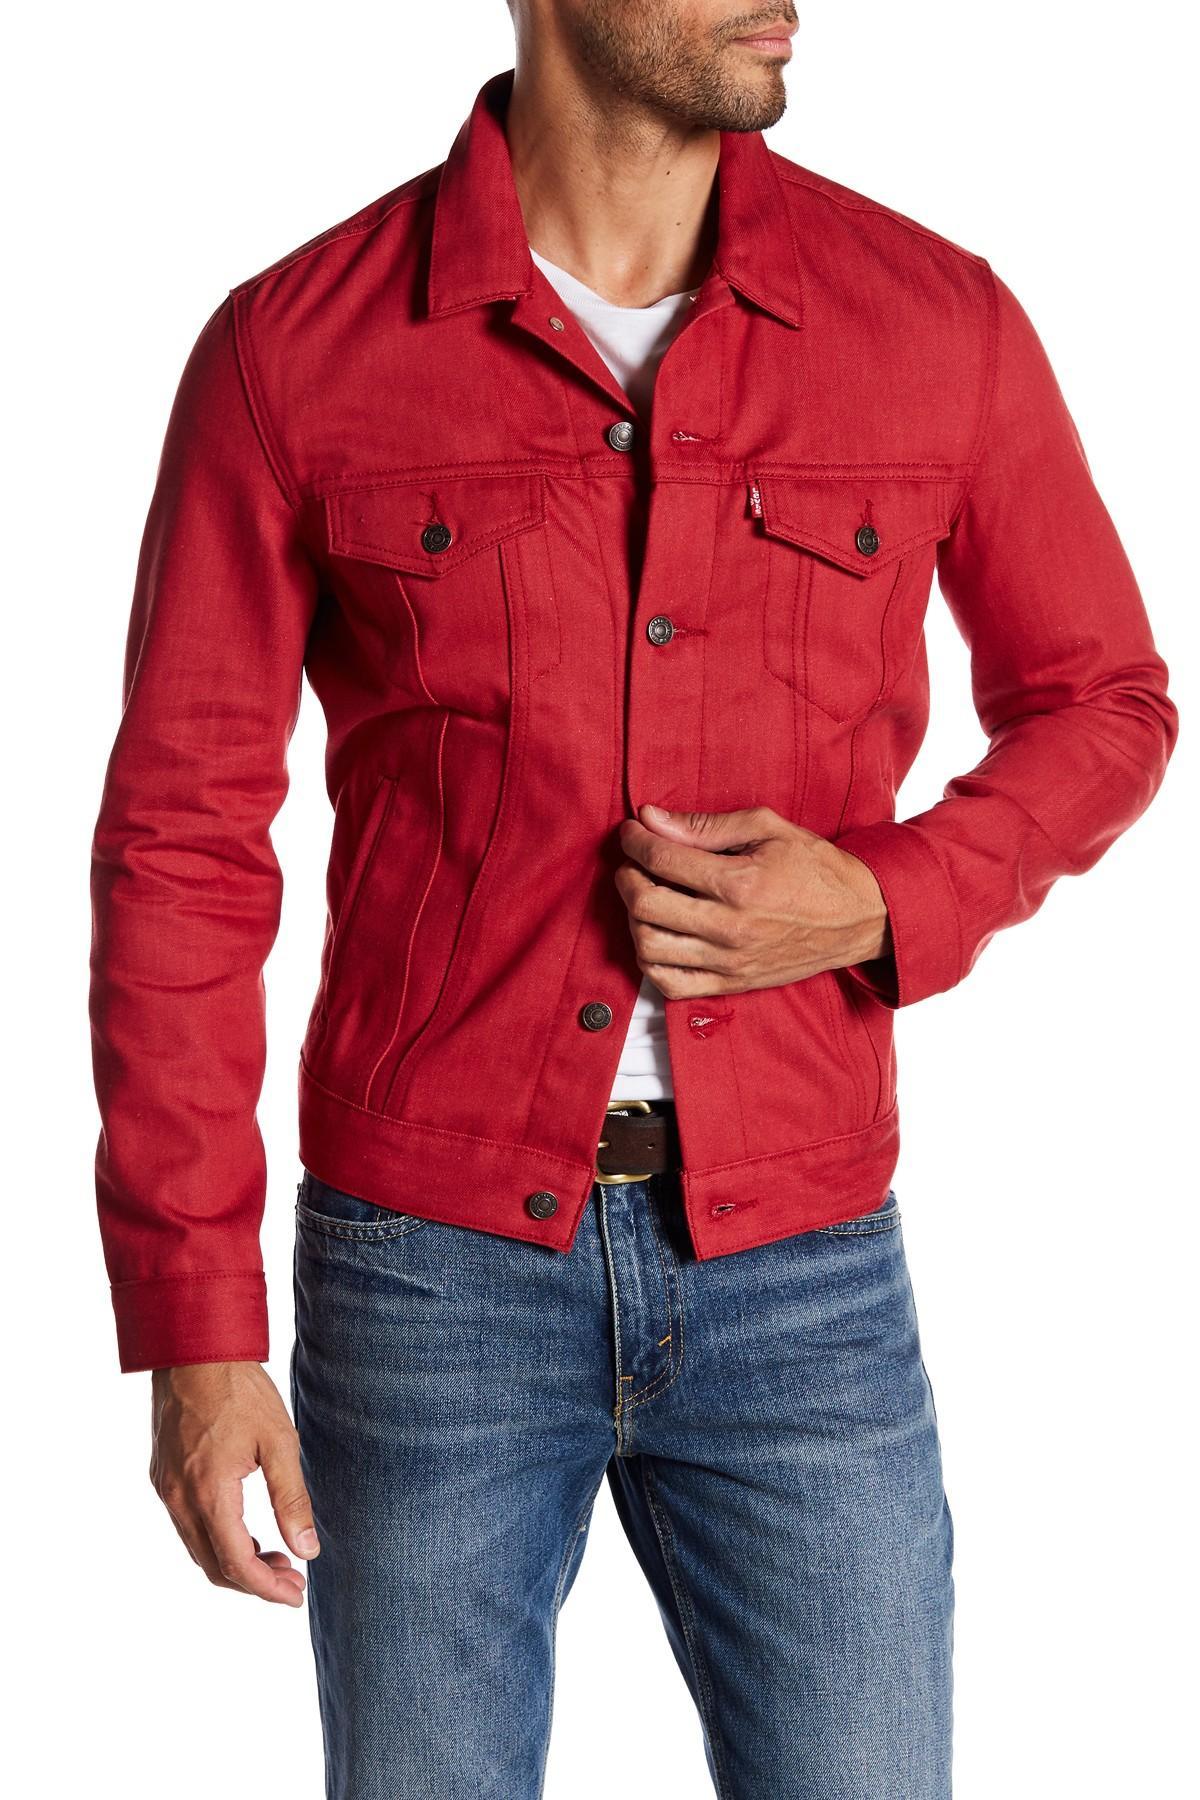 Levi's The Trucker Denim Jacket in Red for Men - Lyst